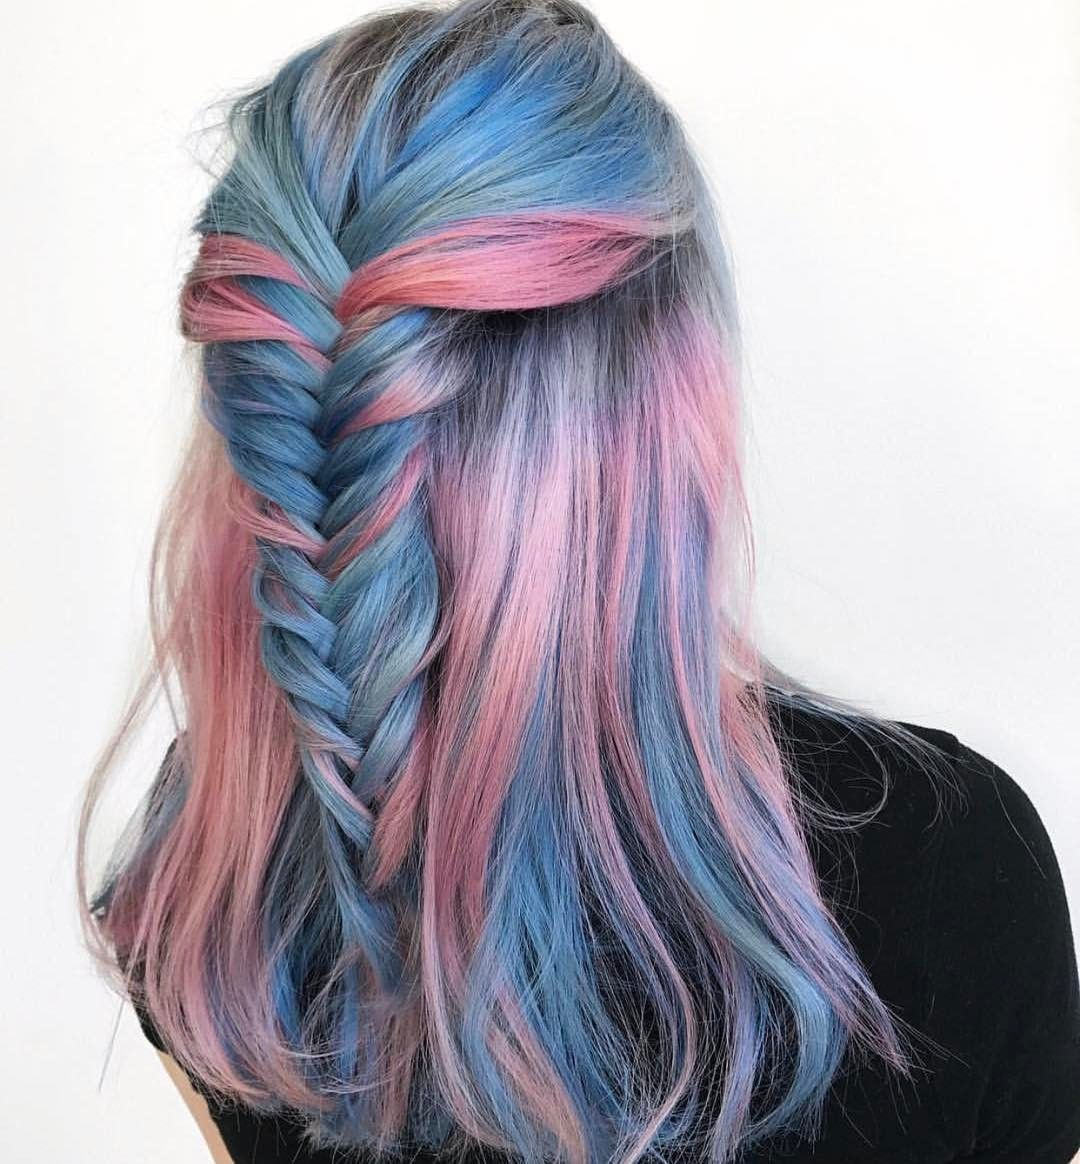 Pin by julie godbersen on hair pinterest mermaid anna and instagram